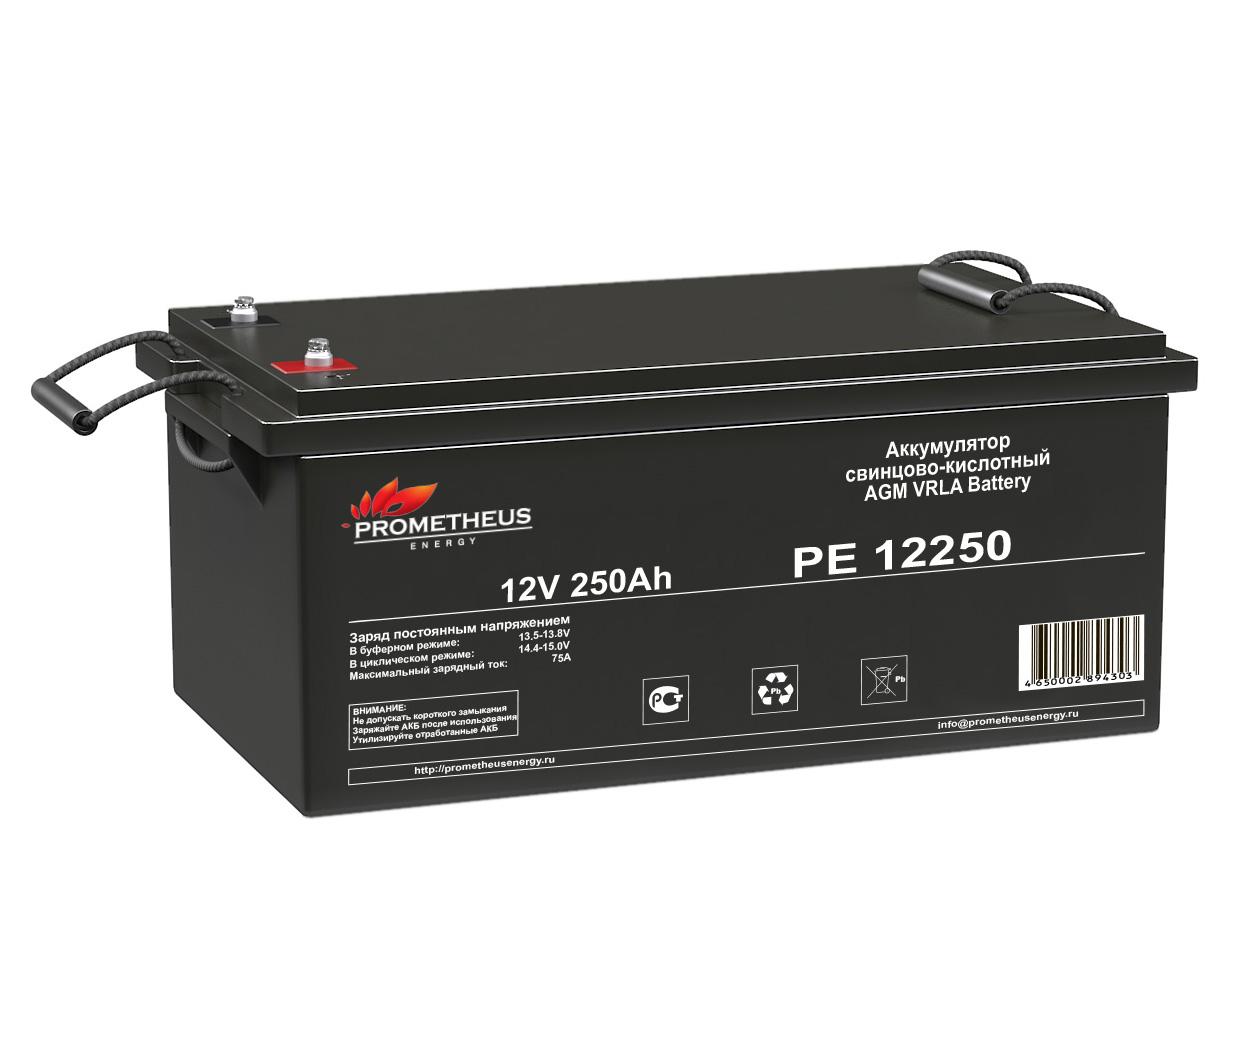 РЕ 12250